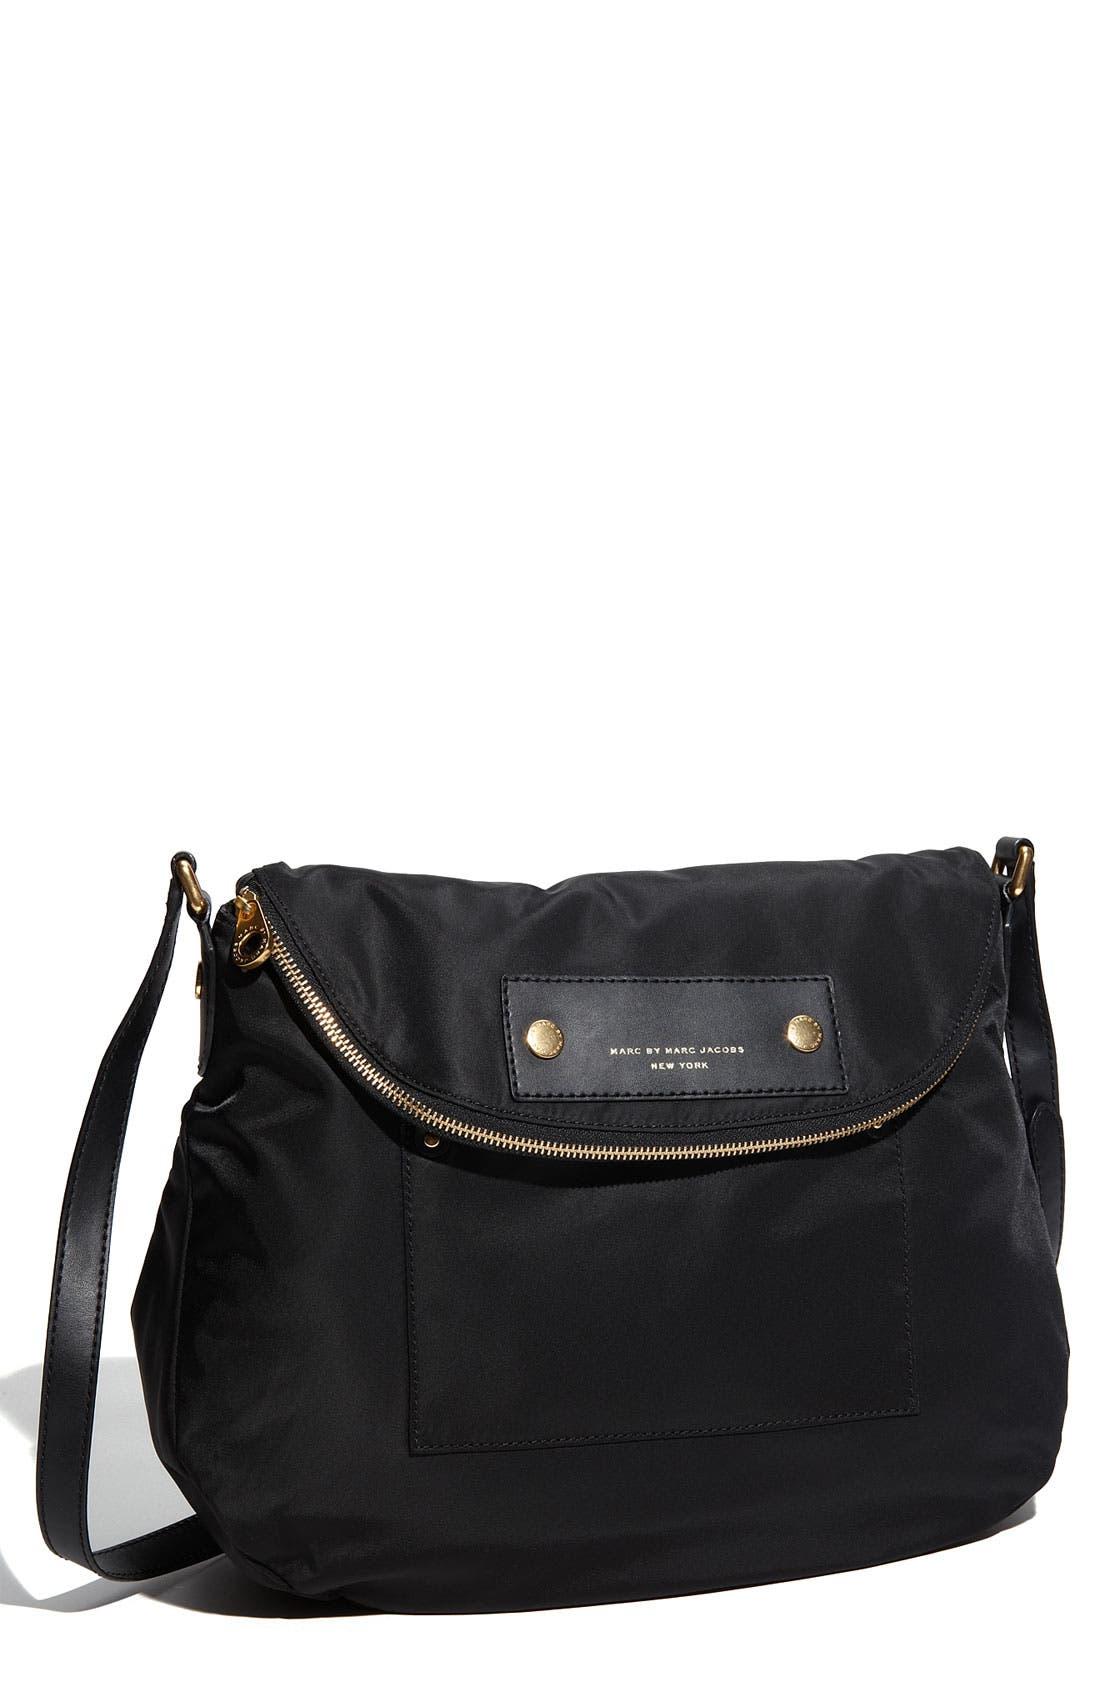 Alternate Image 1 Selected - MARC BY MARC JACOBS 'Preppy Nylon Sasha' Crossbody Bag